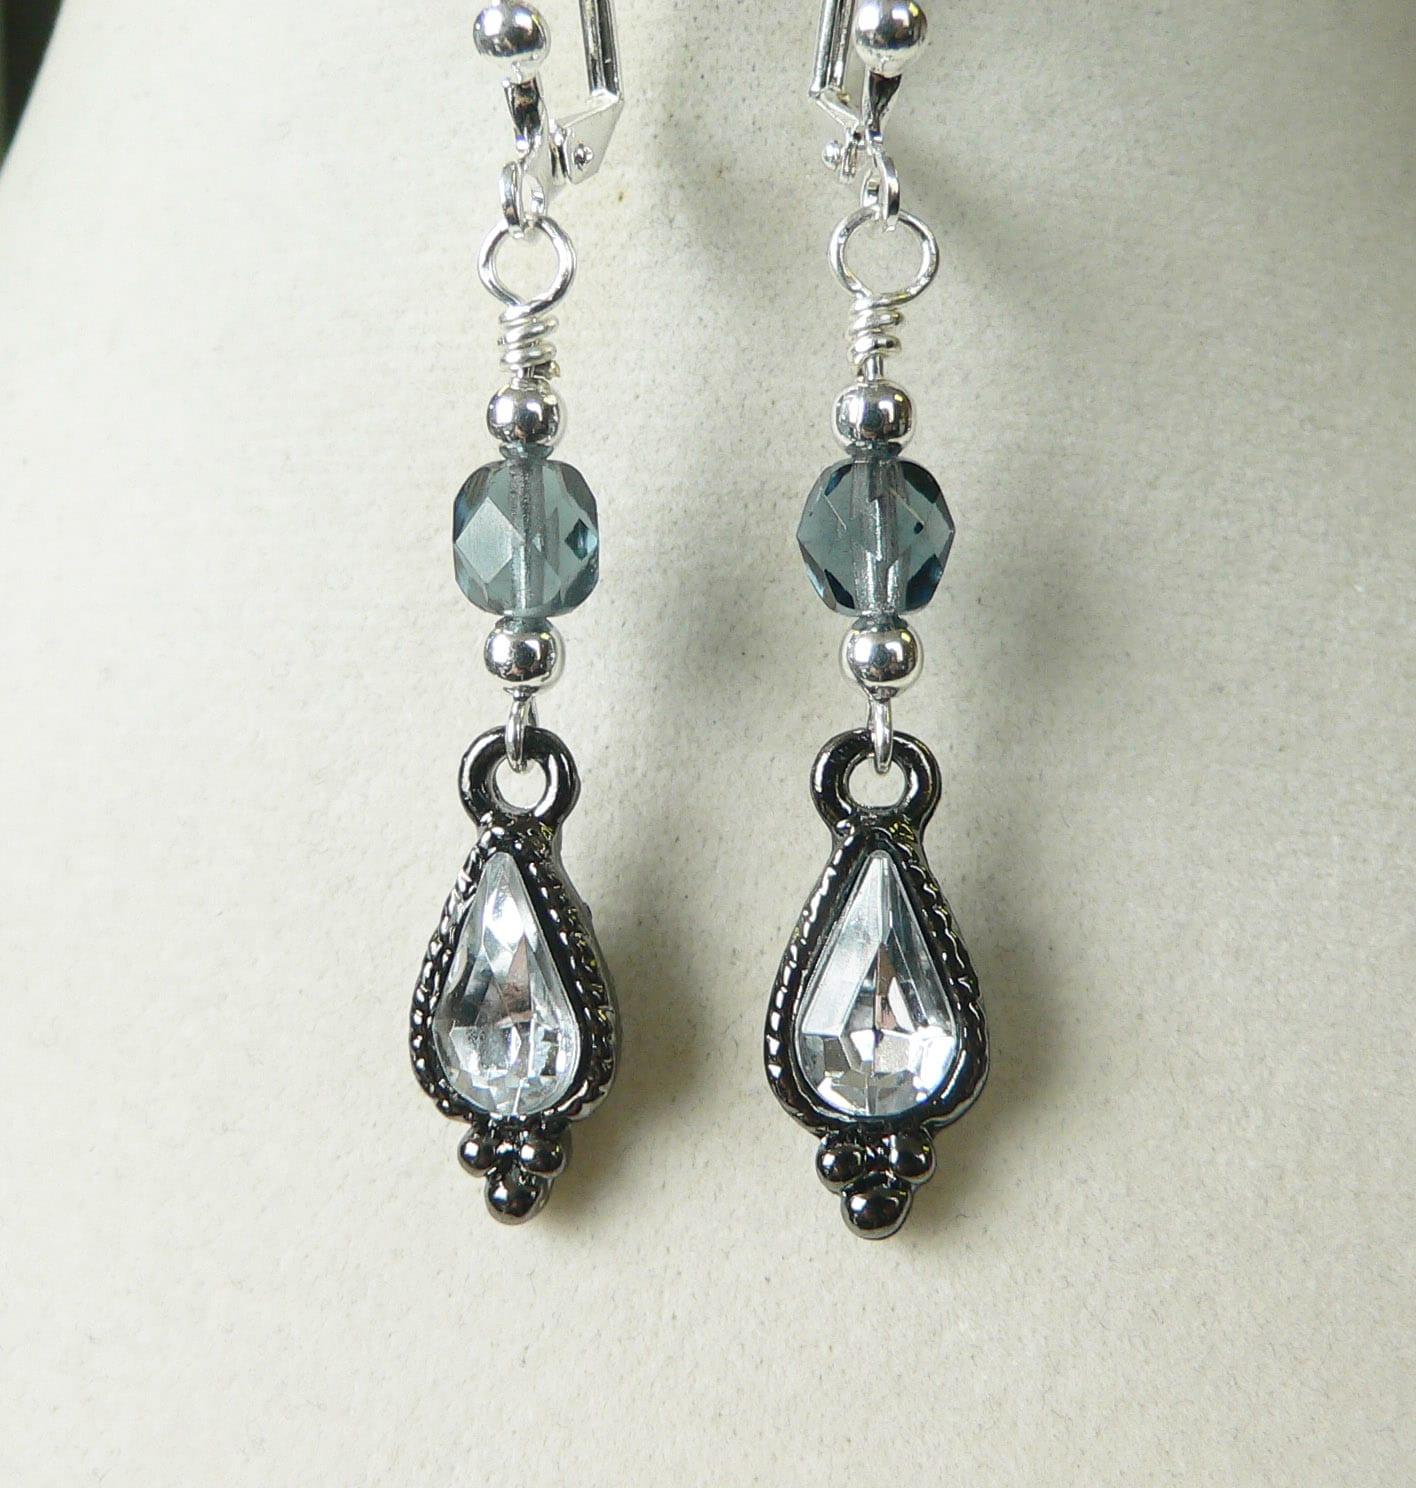 'Allegra' Earrings